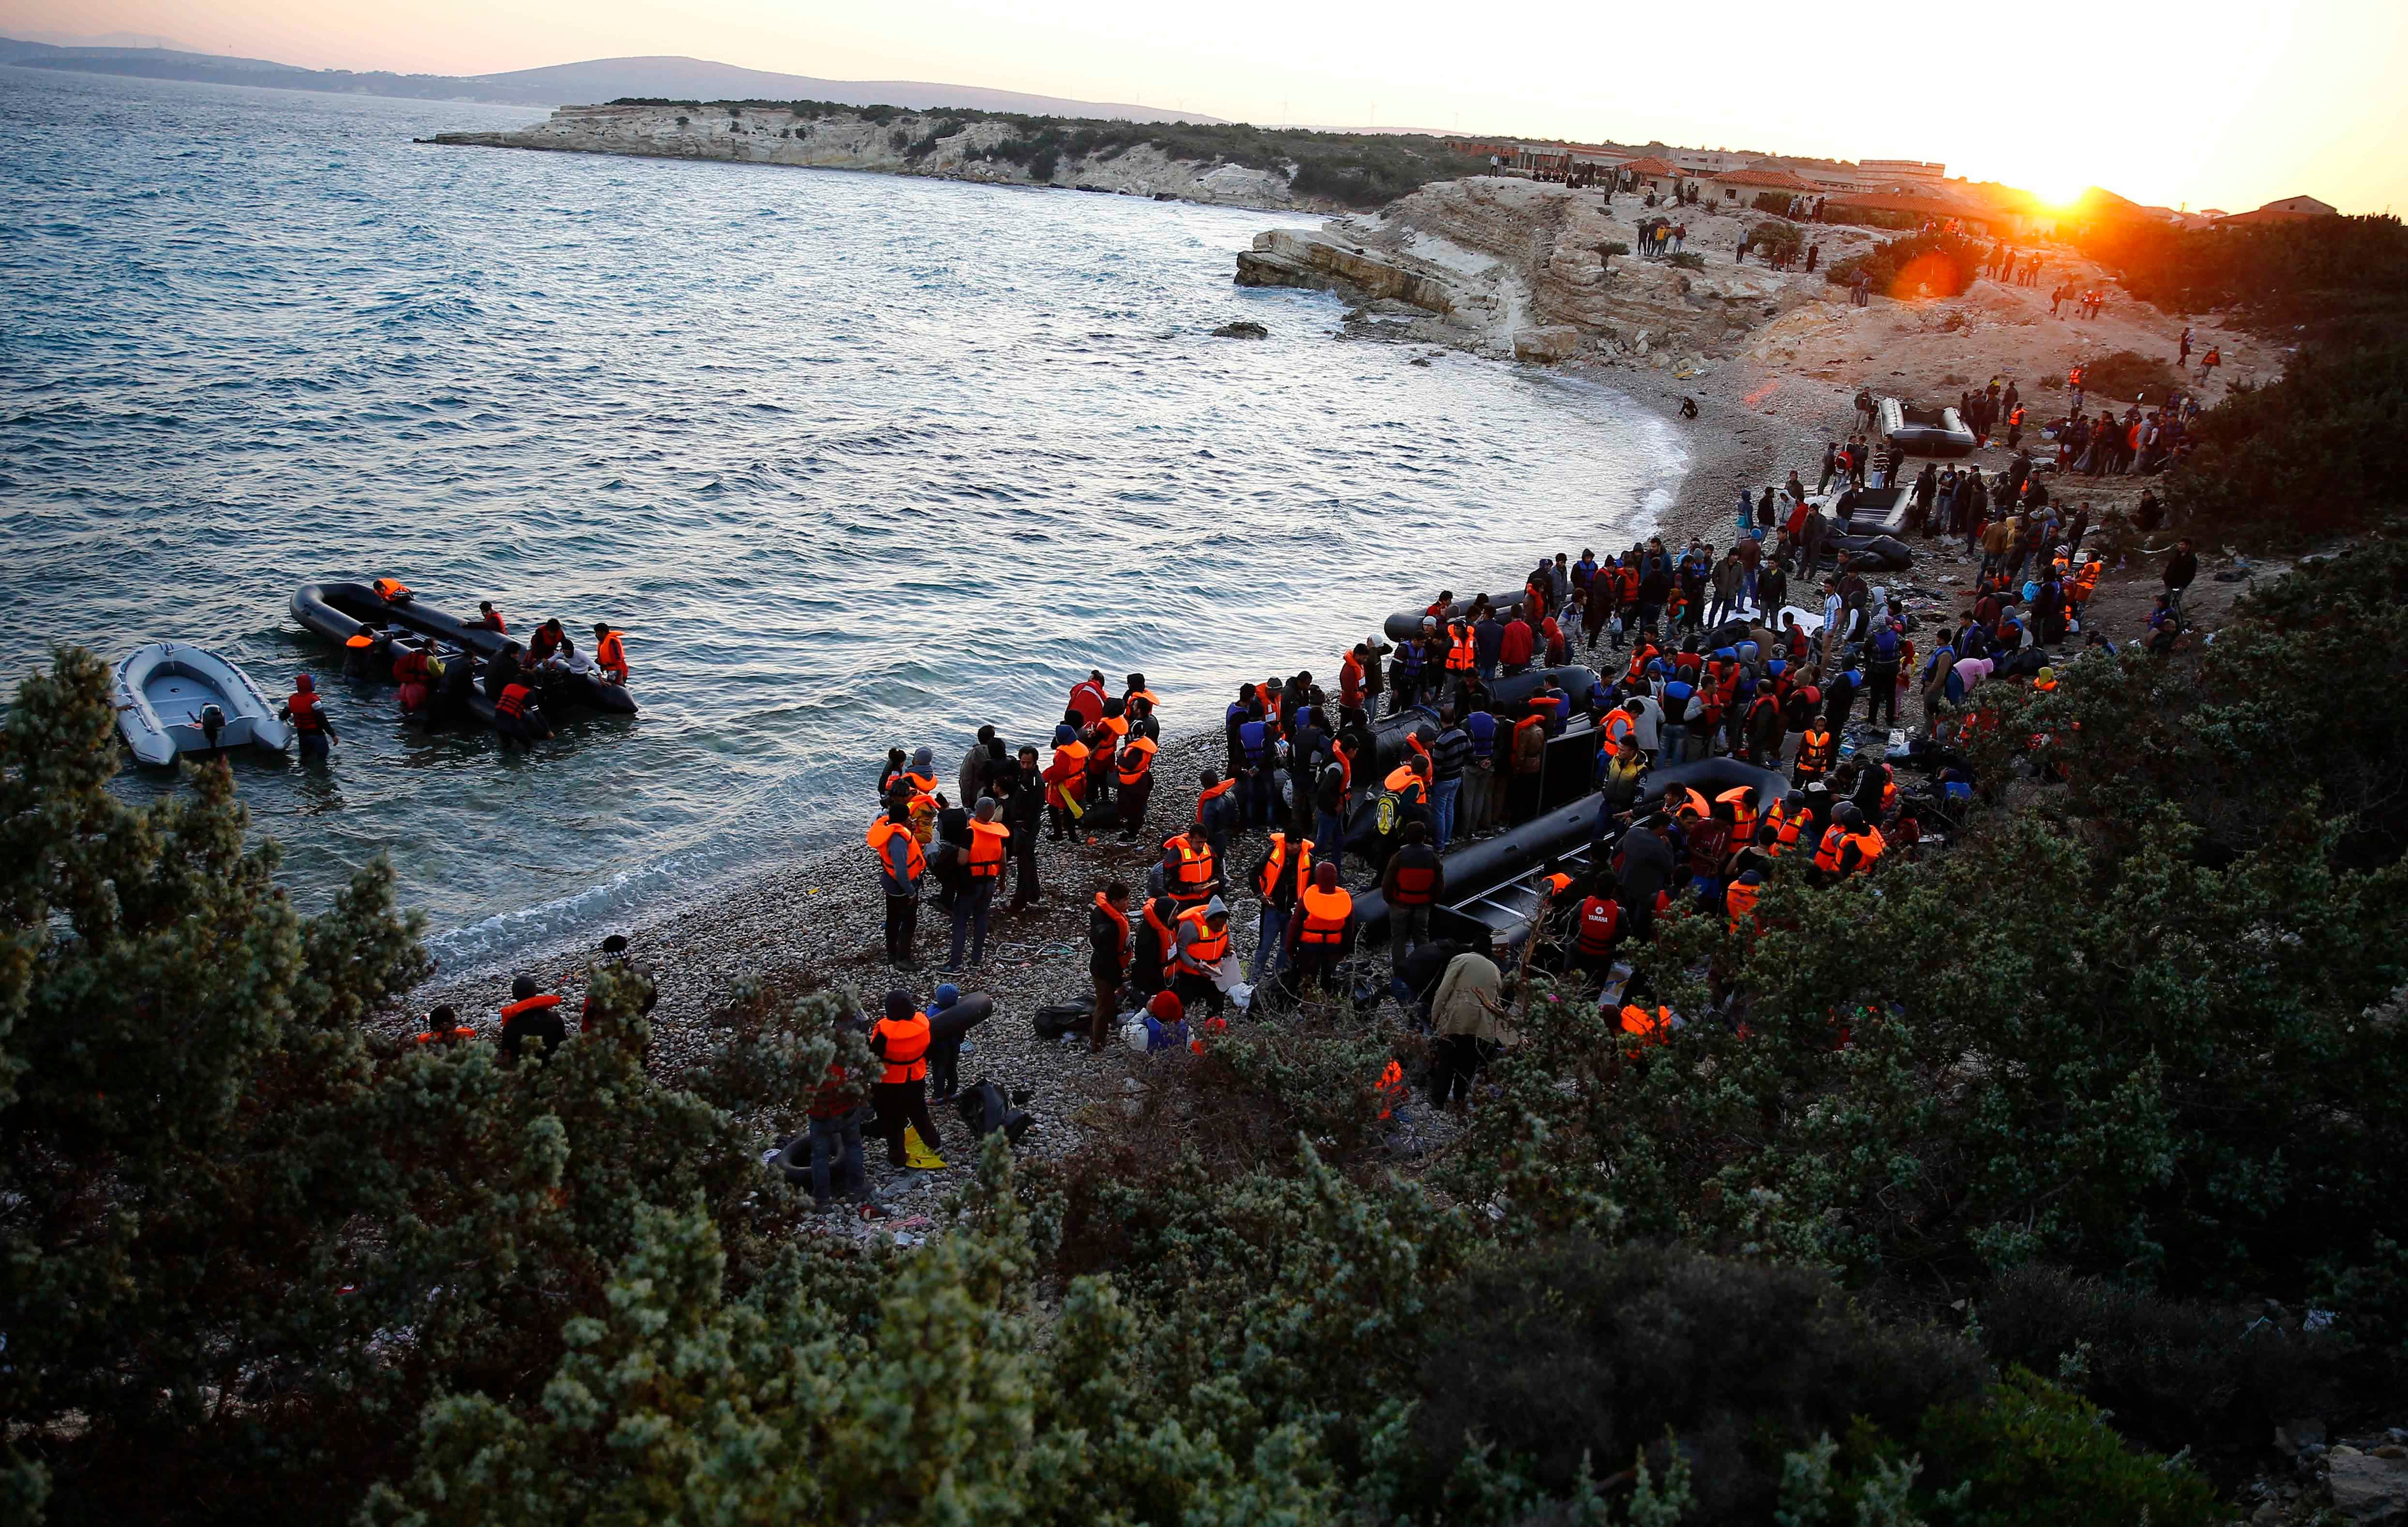 Wading into the Aegean Sea